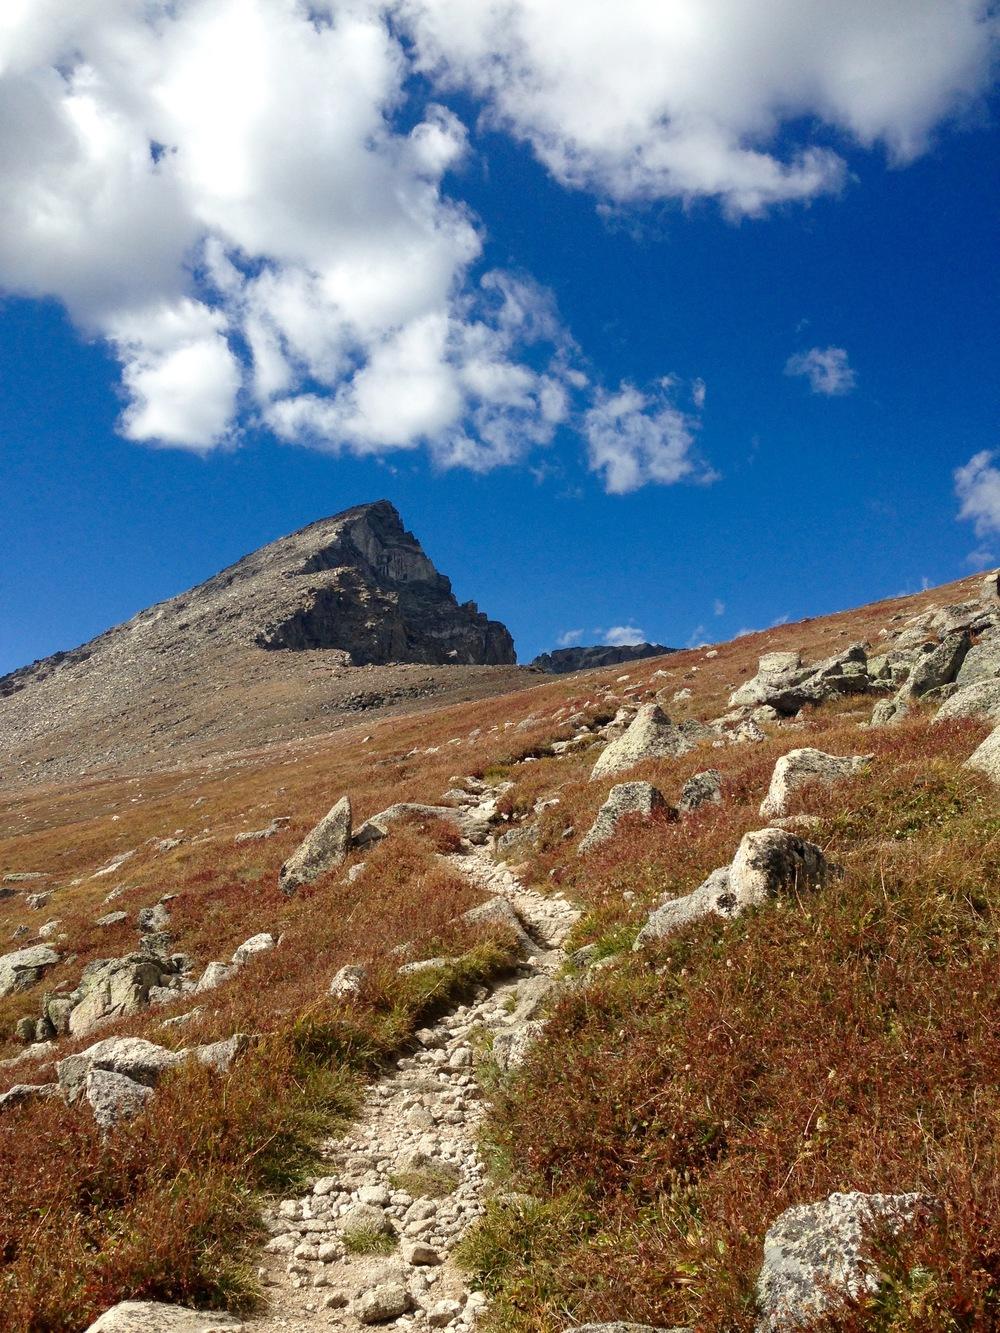 S Arapaho Peak, 13,300 ft